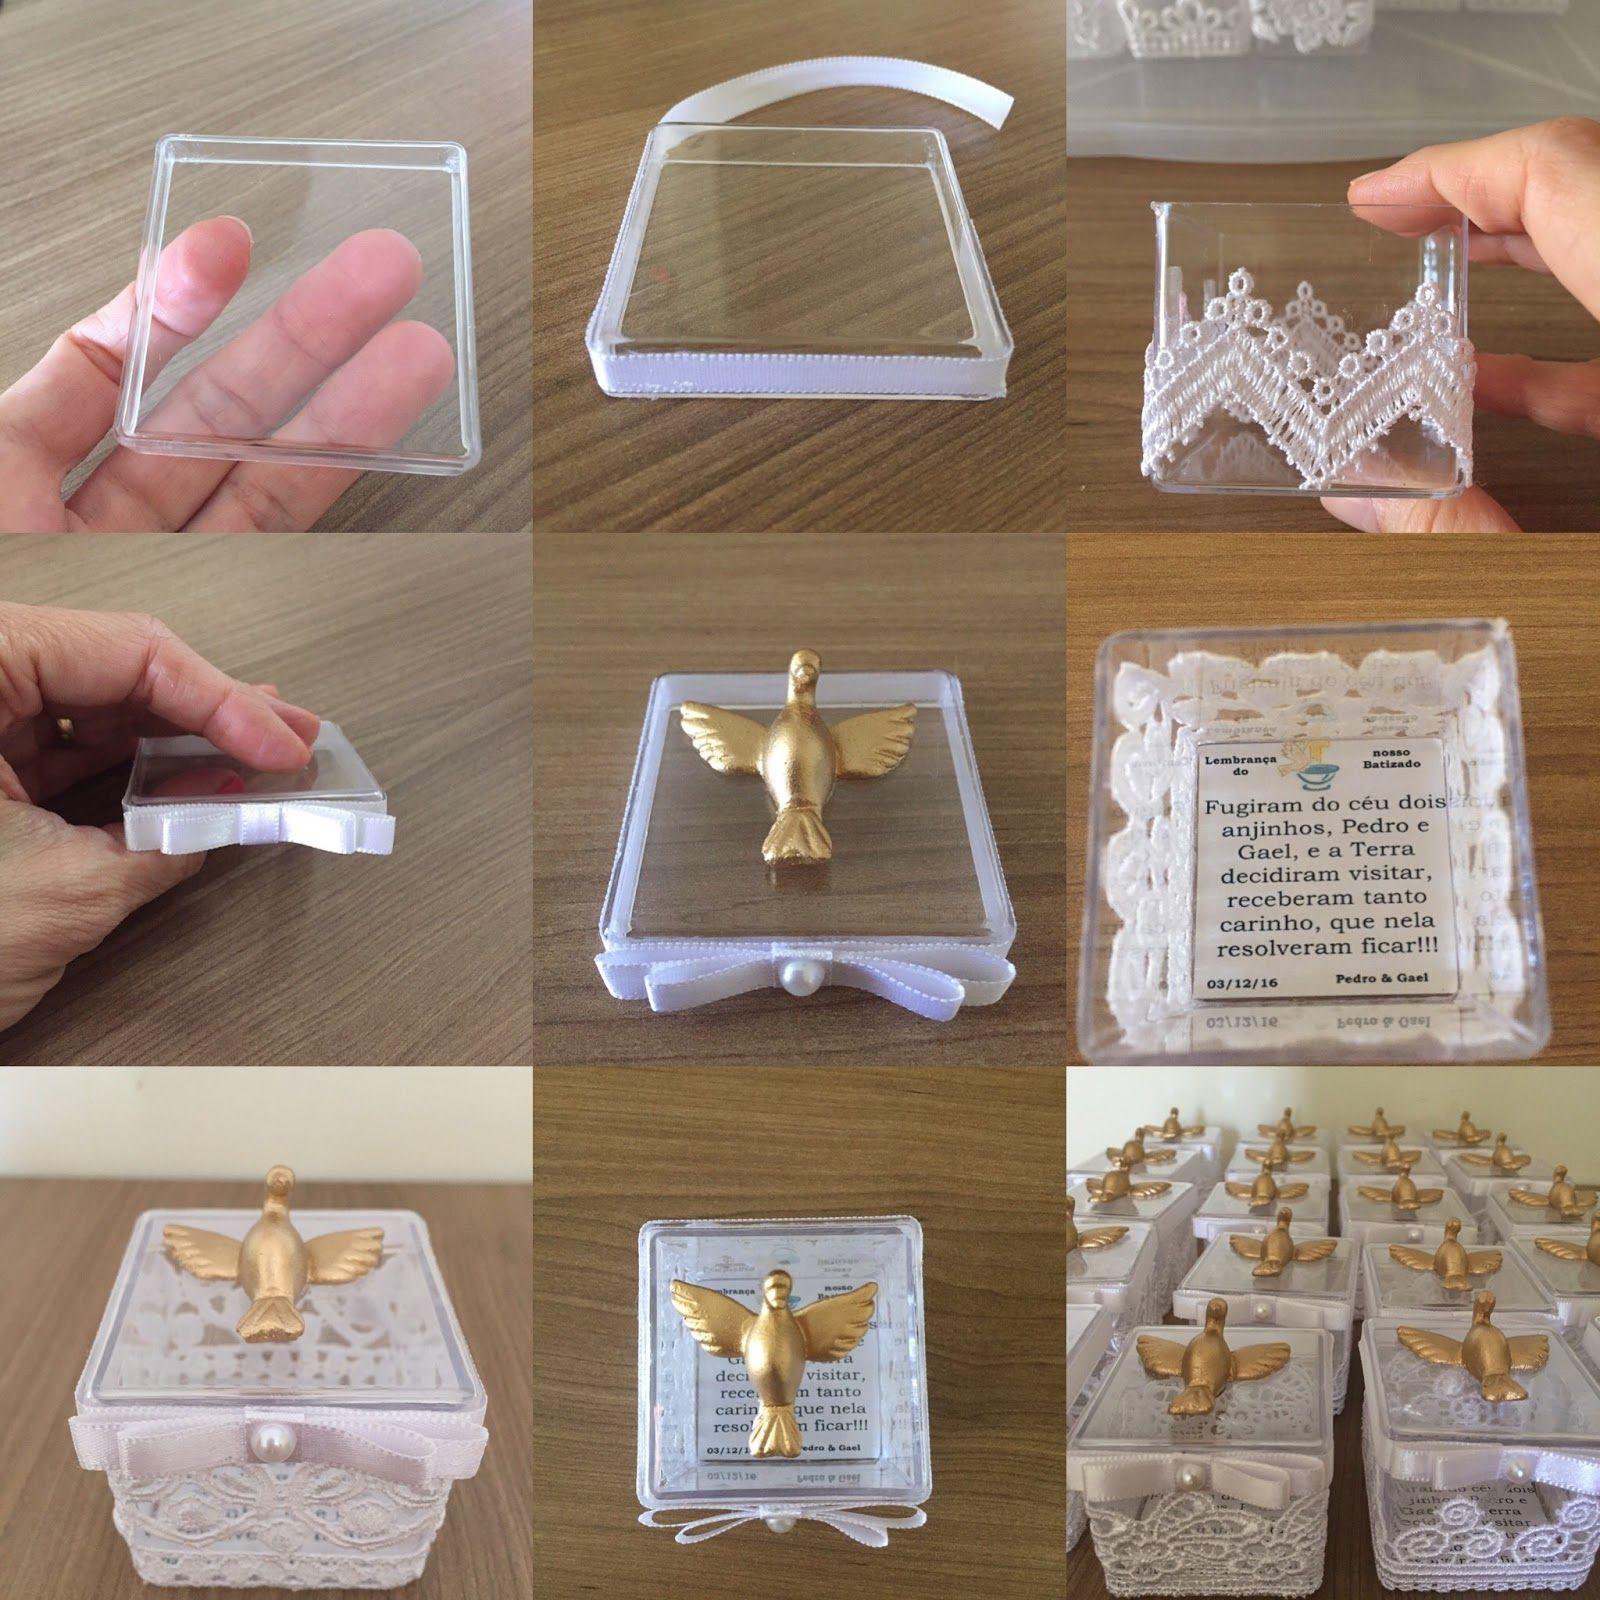 Armario Horizontal Inox ~ como fazer lembrancinha para batizado Marshmallow Pinterest Lembrancinhas para batizado